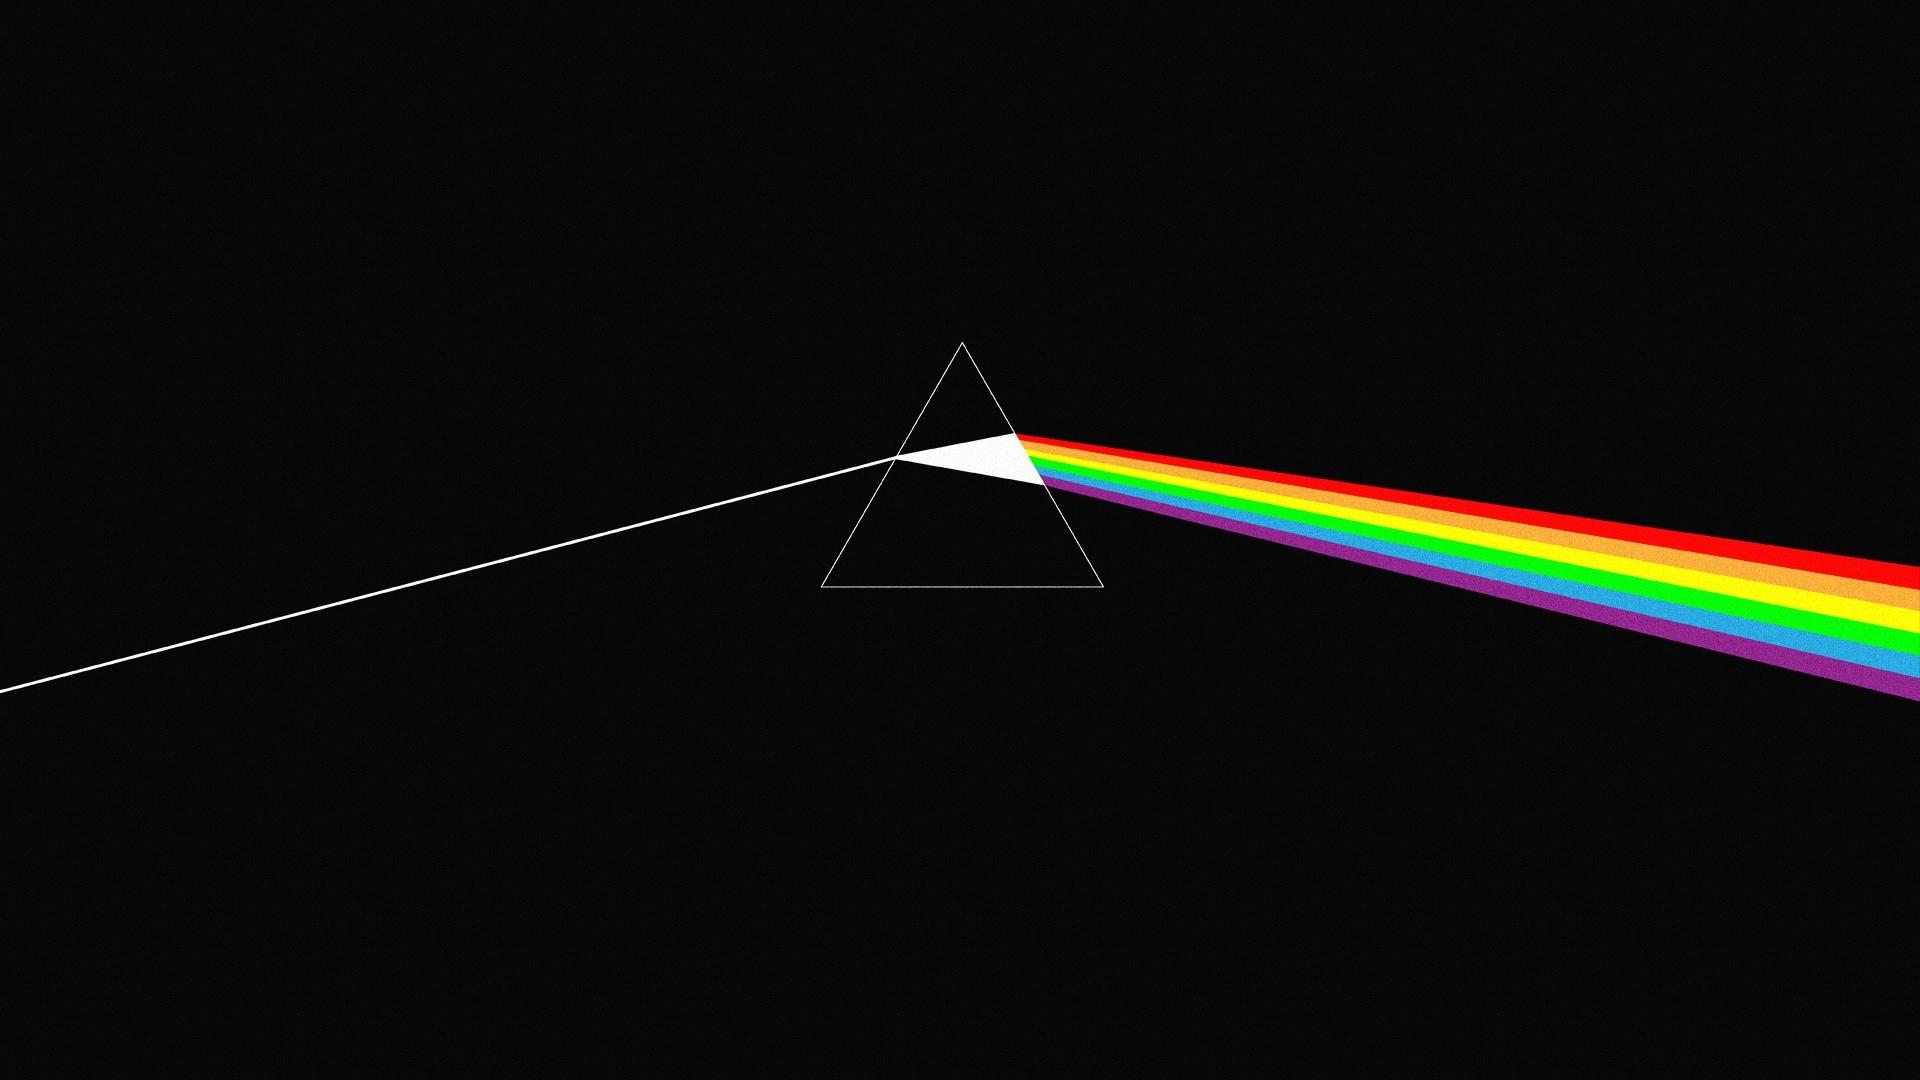 Google themes pink floyd - Pink Floyd Wallpaper Hd 56 Pink Floyd Wallpaper Hd